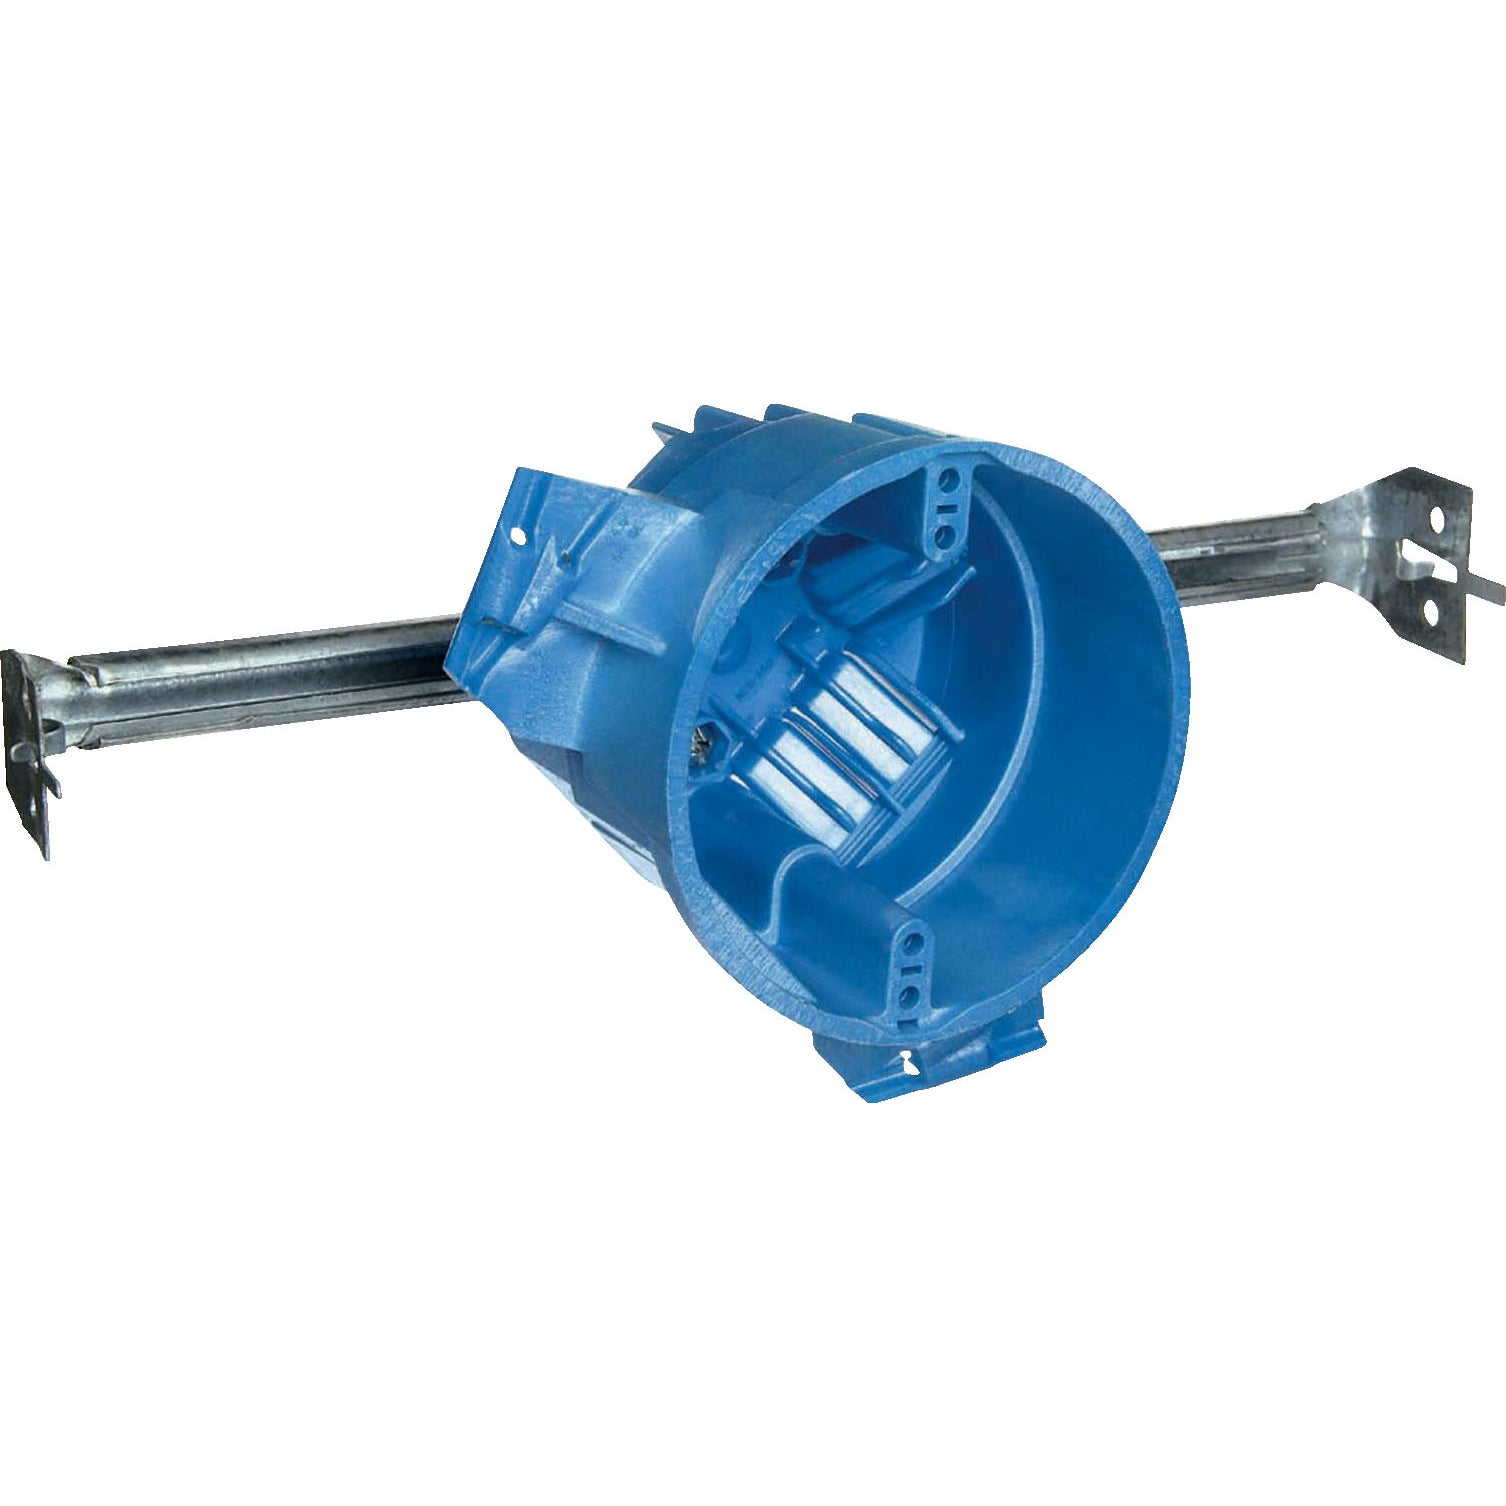 Carlon 3-5/8 in. H Round 1 Gang Electrical Box Blue PVC (...